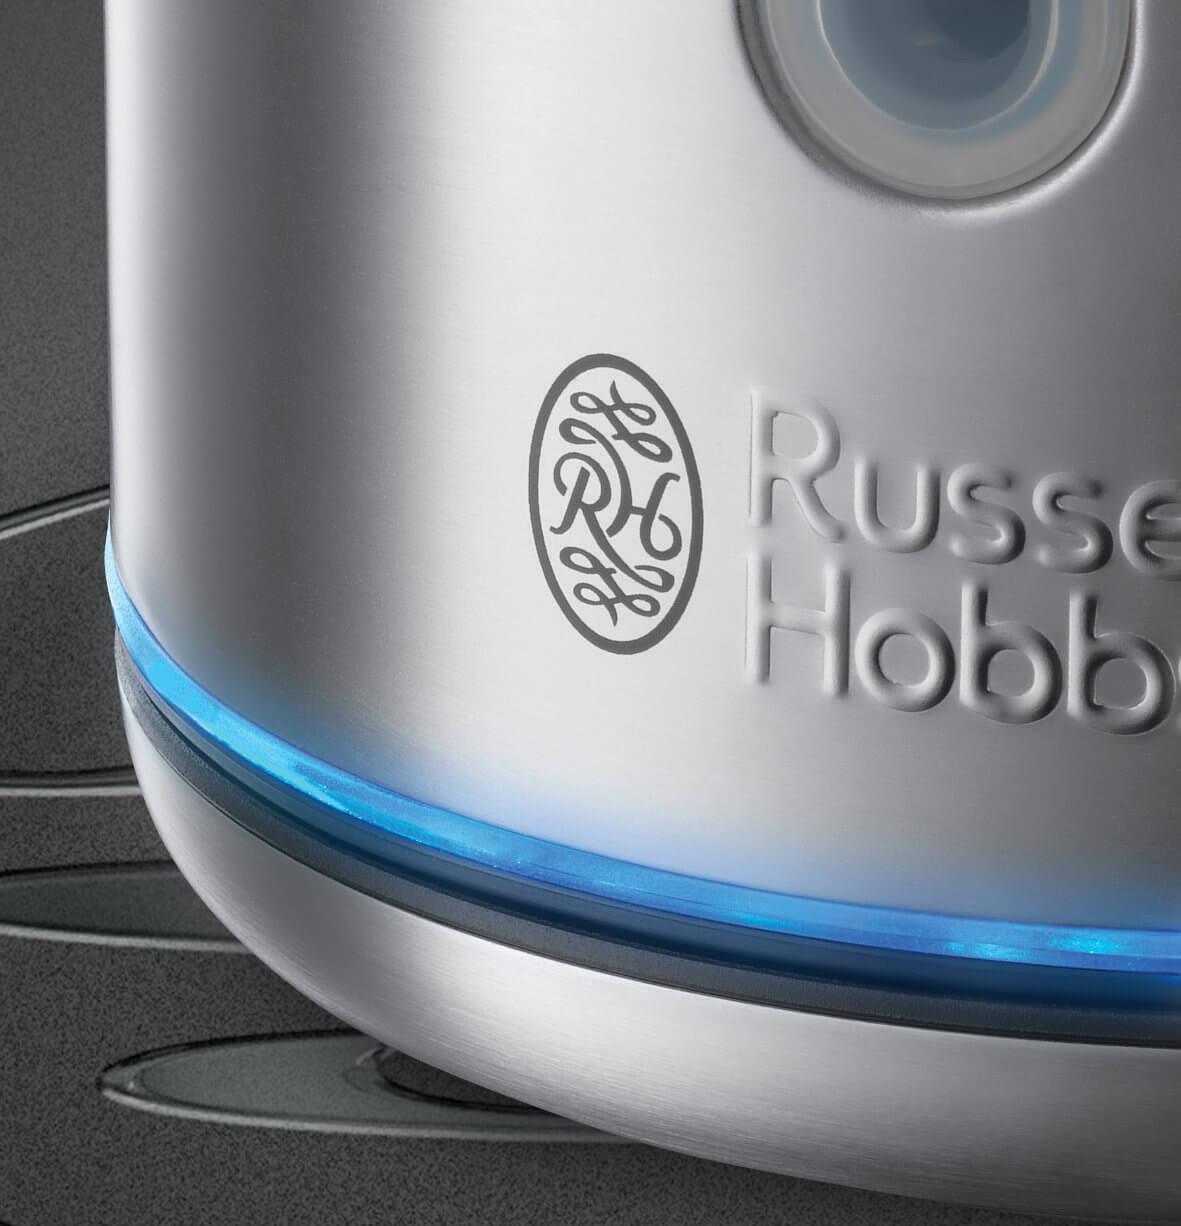 Czajnik Russell Hobbs Buckingham 20460-70